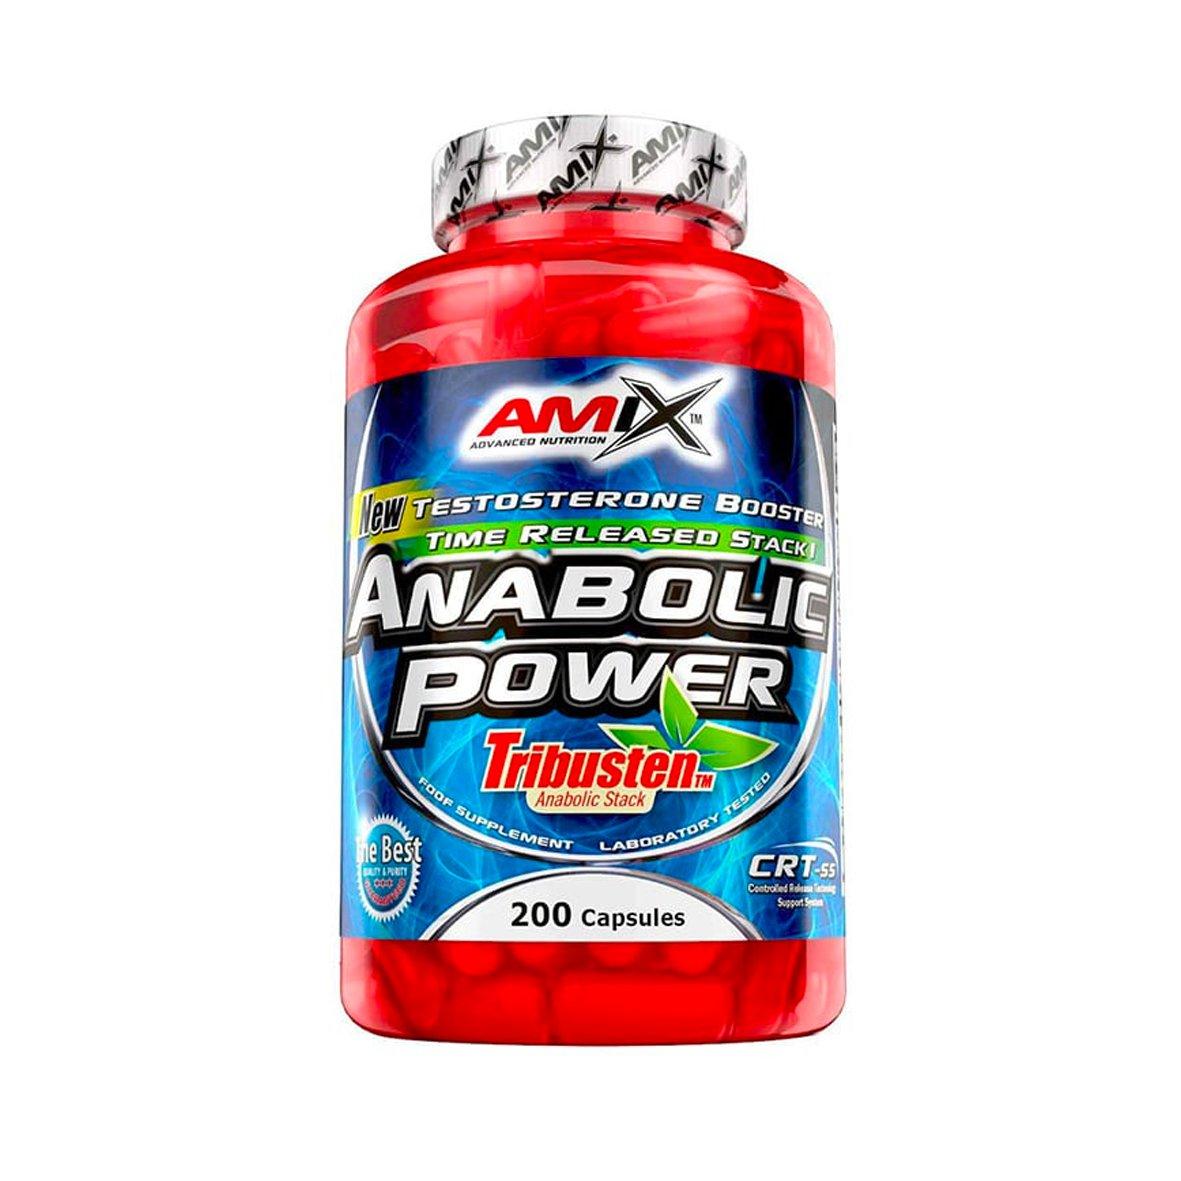 Anabolic Power Tribusten 200 caps